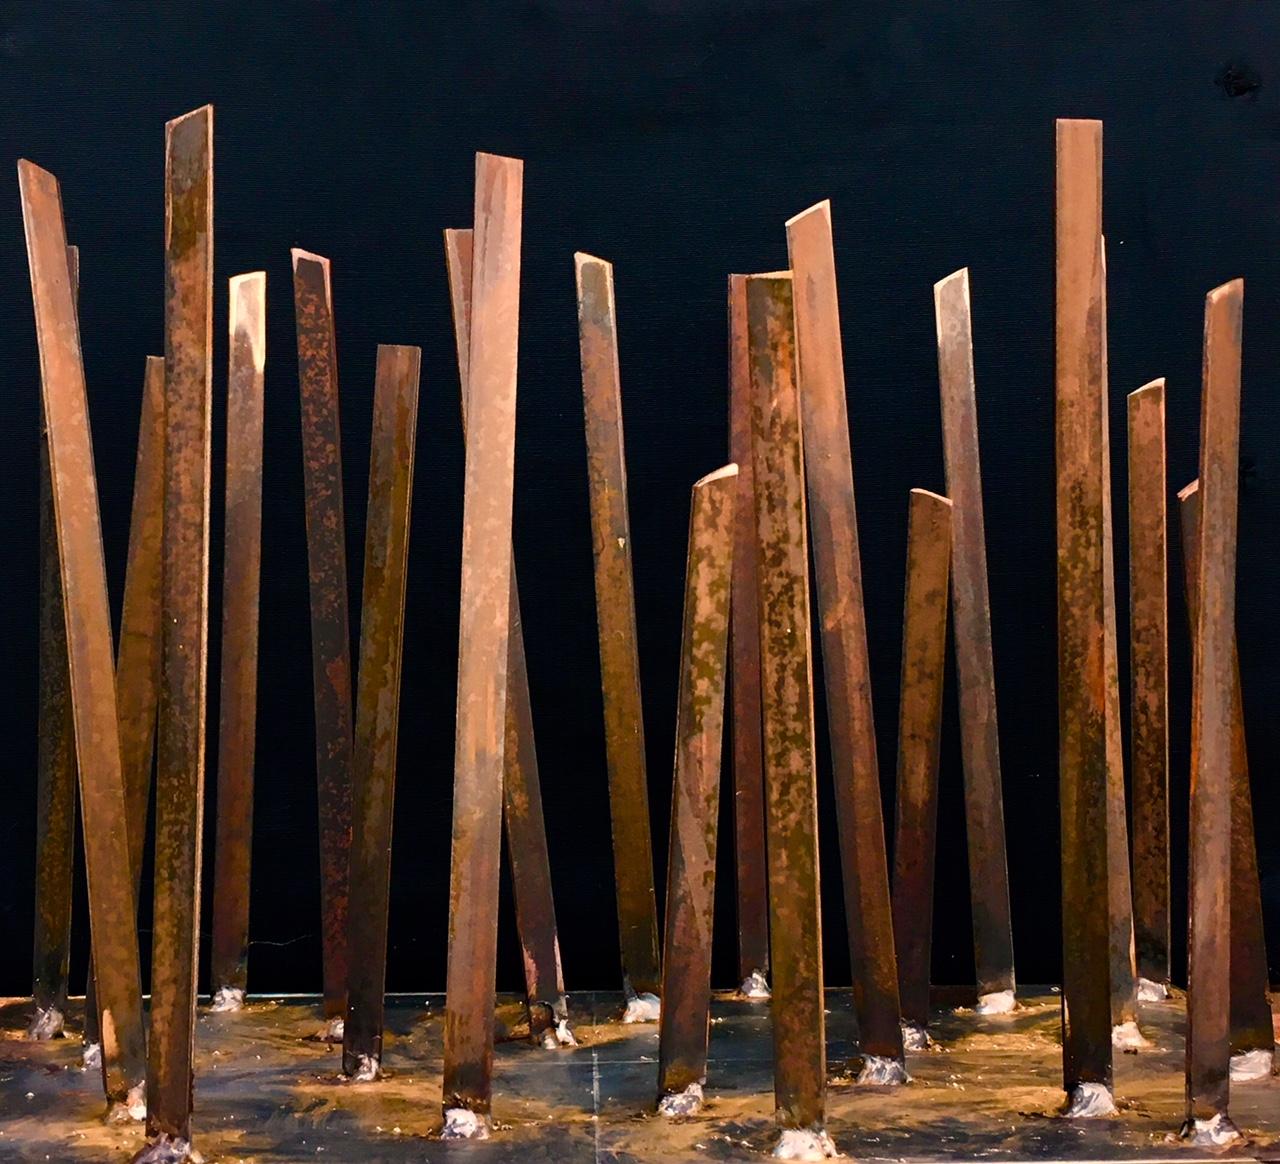 prouchet dalla costa sculpture acier corten